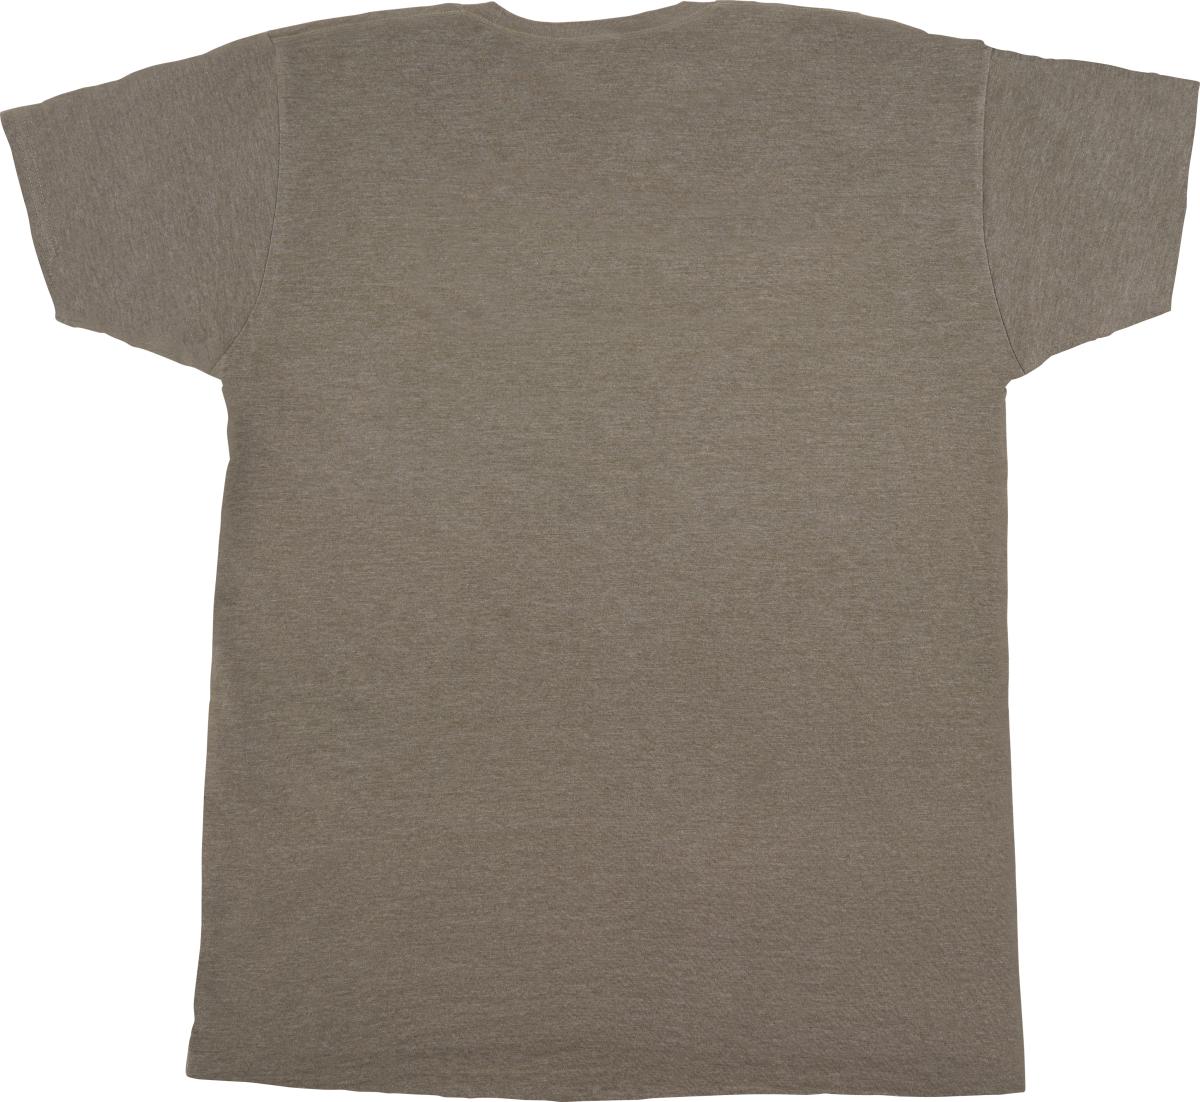 Charvel Charvel® Toothpaste Logo T-Shirt, Heather Green, S